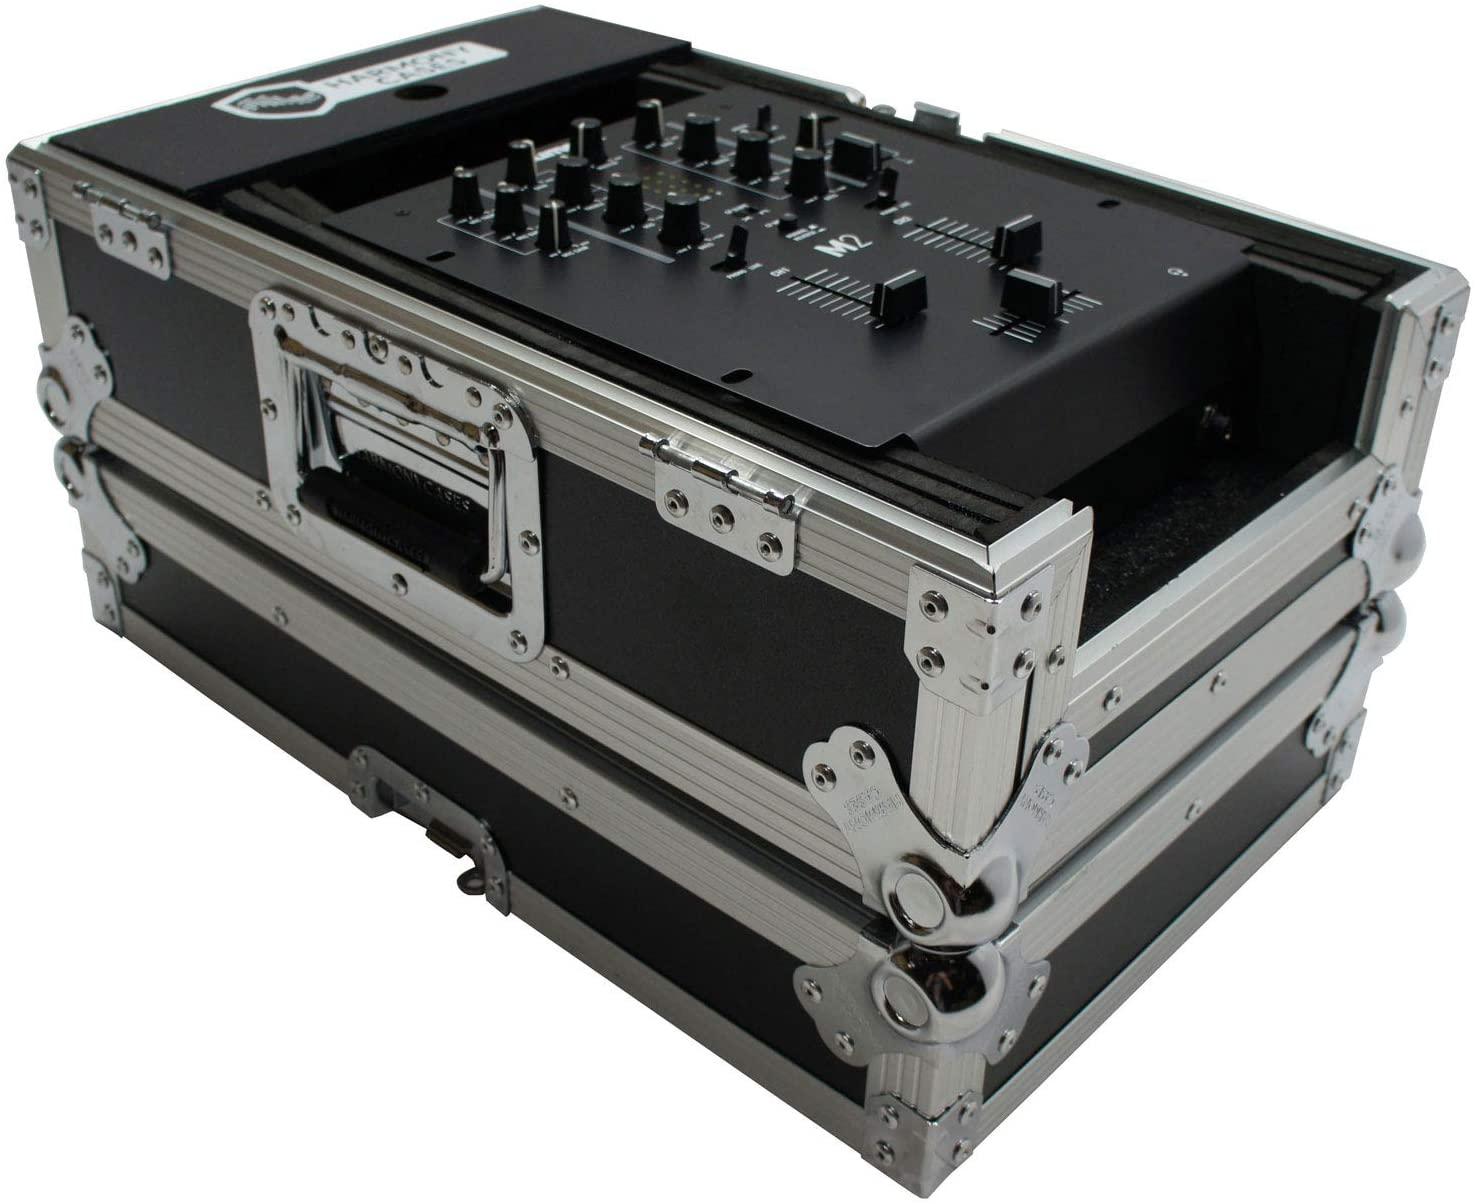 Harmony Cases HC10MIX Flight DJ Road Travel 10 Mixer Custom Case Compatible with Rane 62